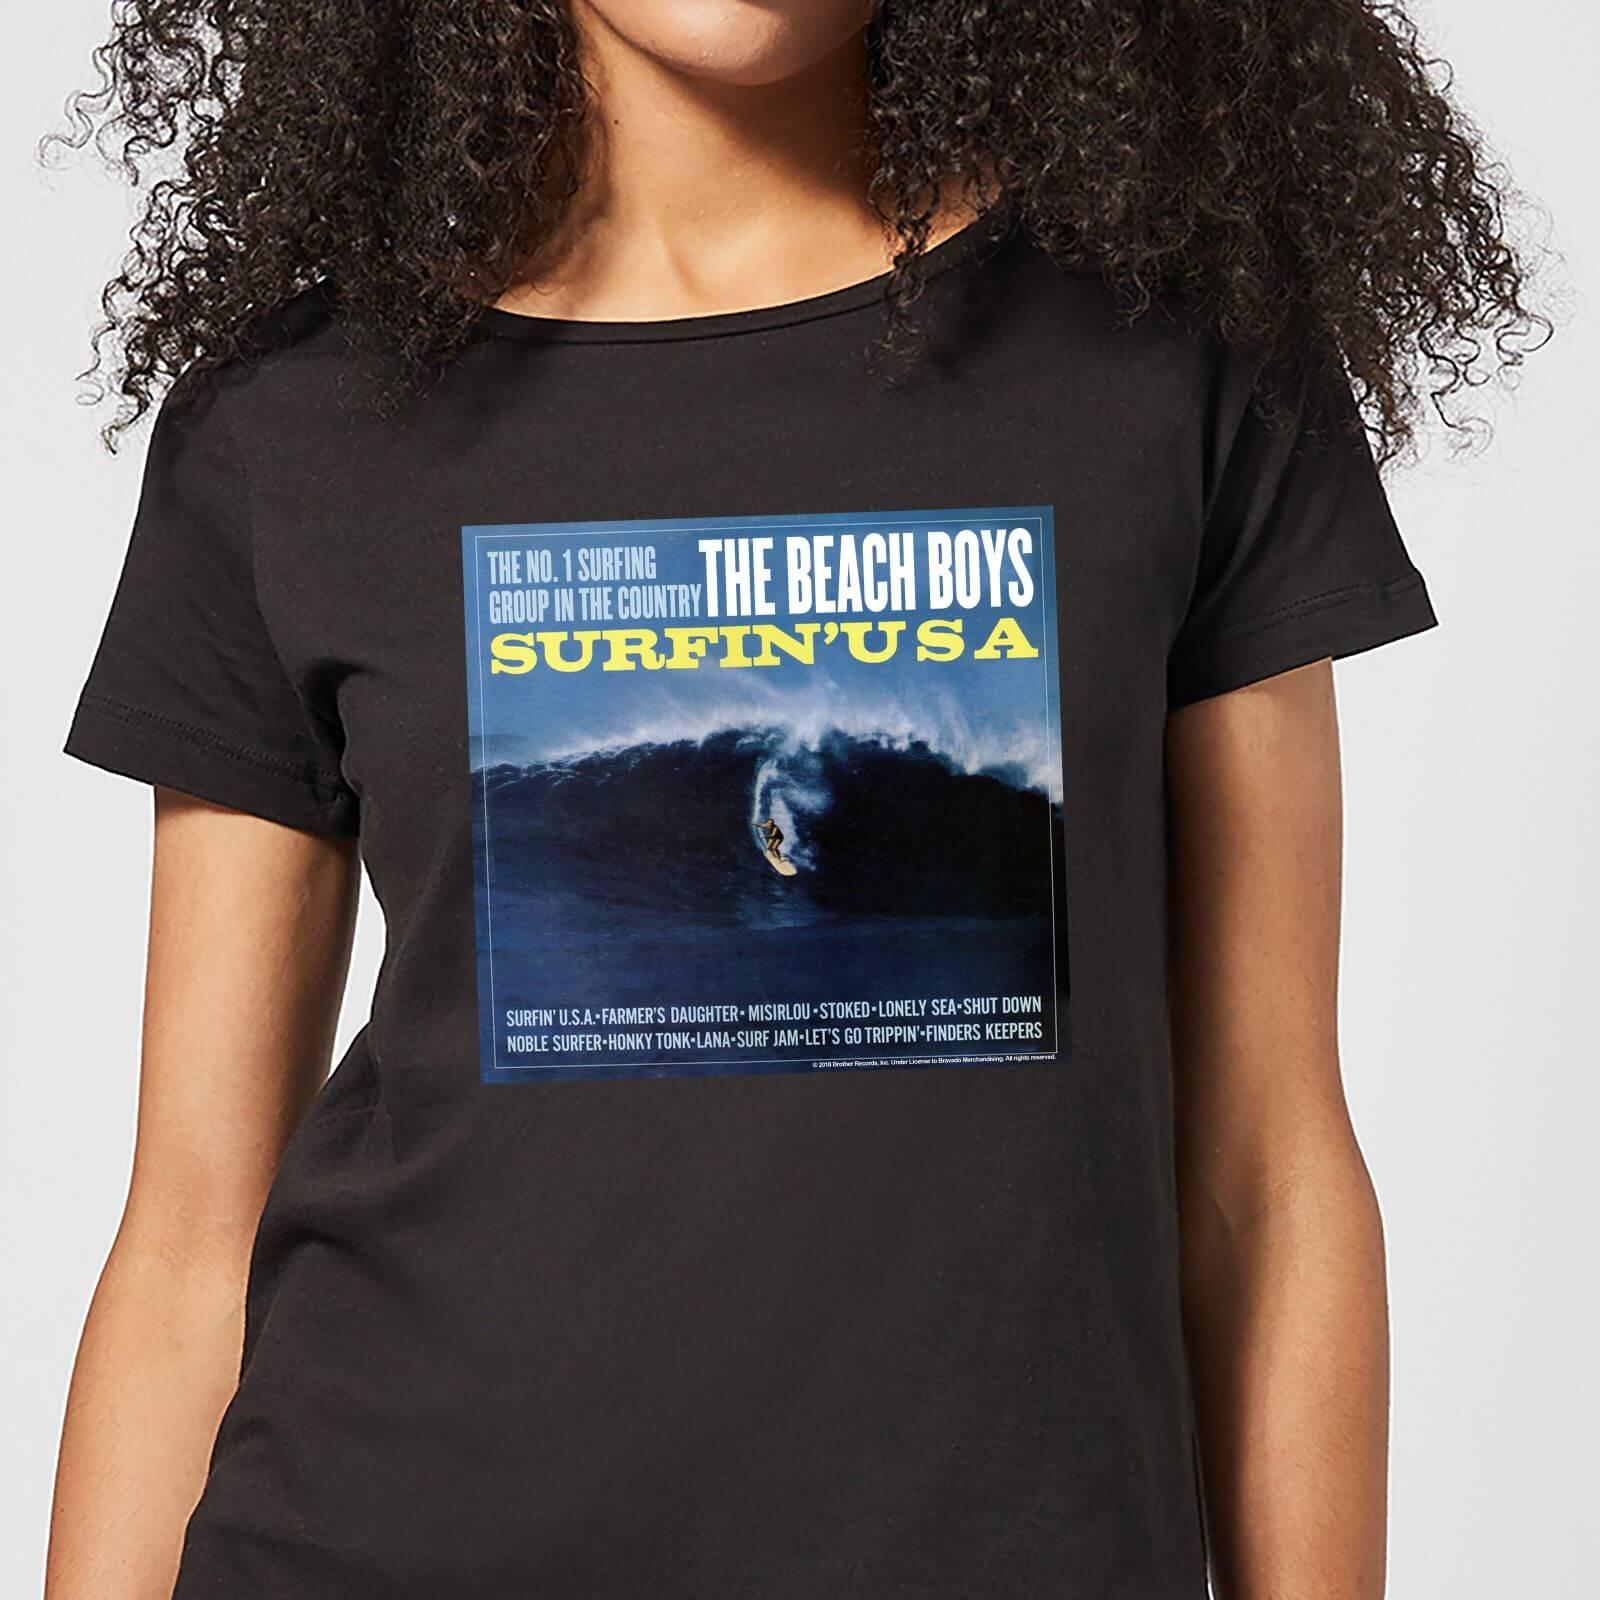 fa303f2a The Beach Boys Surfin USA Women's T-Shirt - Black Clothing | Zavvi